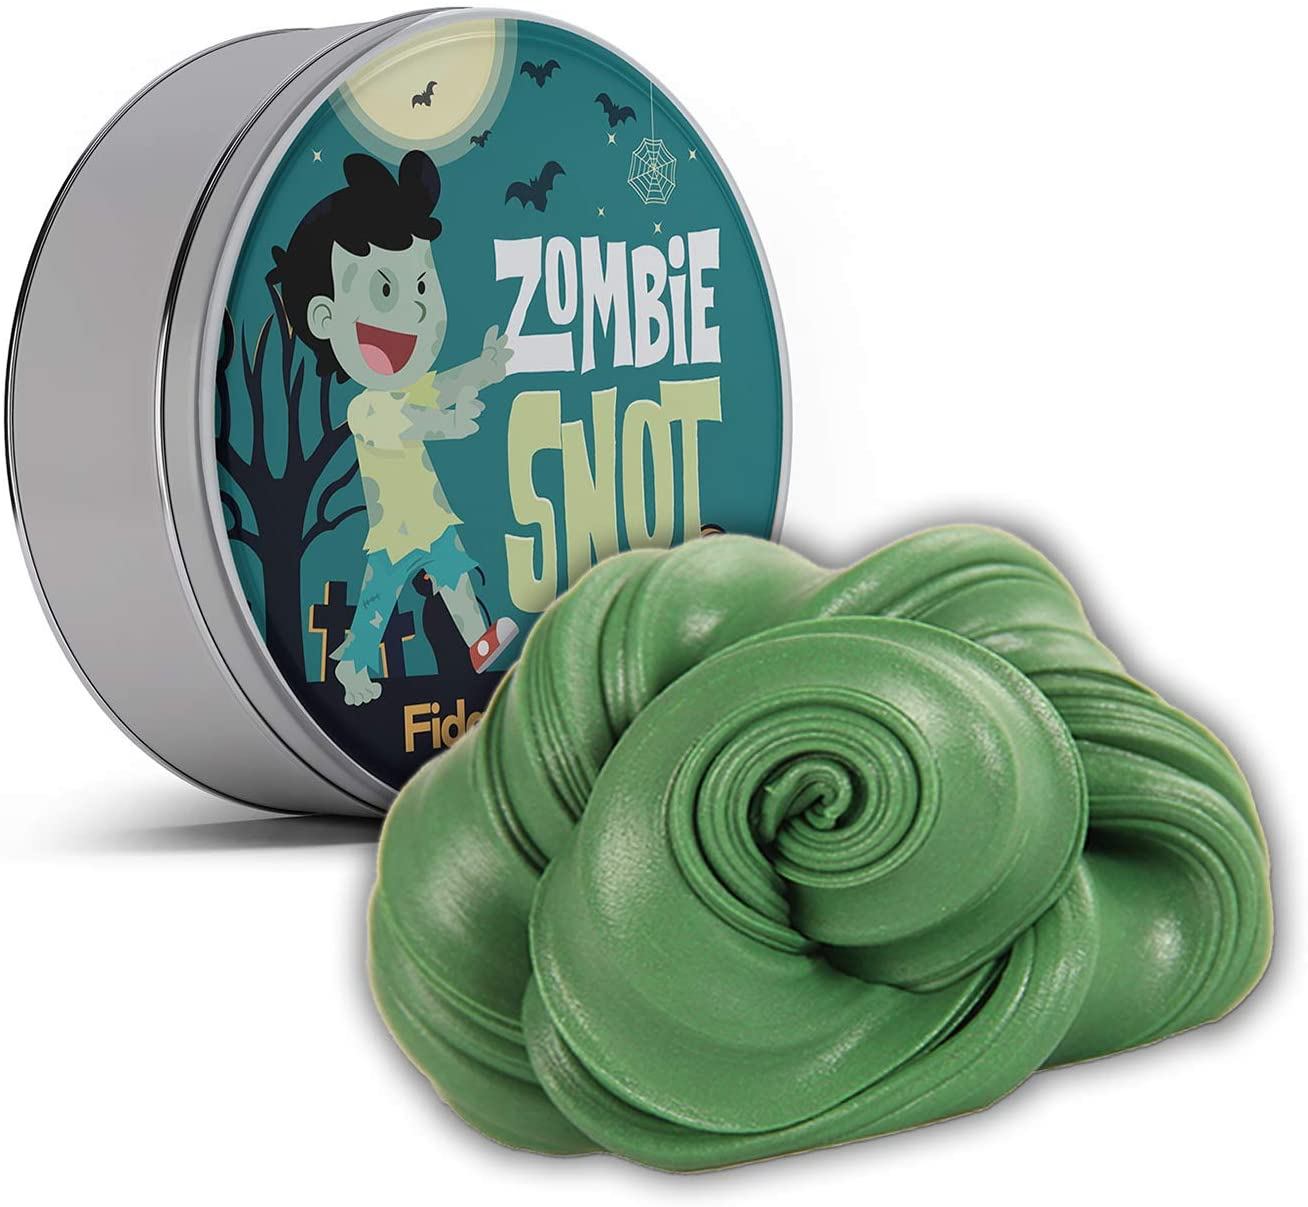 stocking-stuffer-ideas-for-kids-zombie-snot